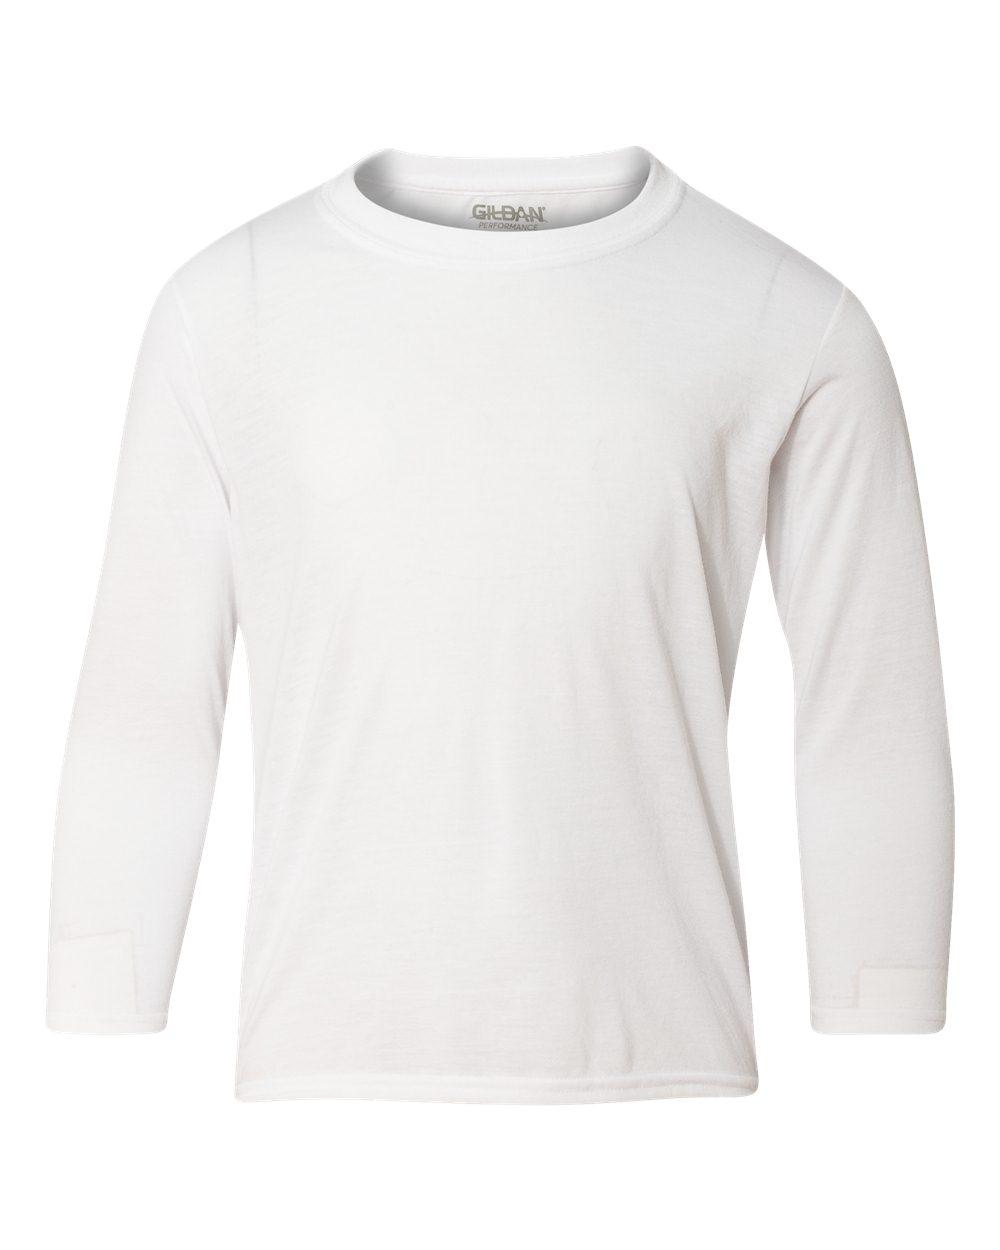 42400b Gildan Youth Core Performance Long Sleeve T Shirt